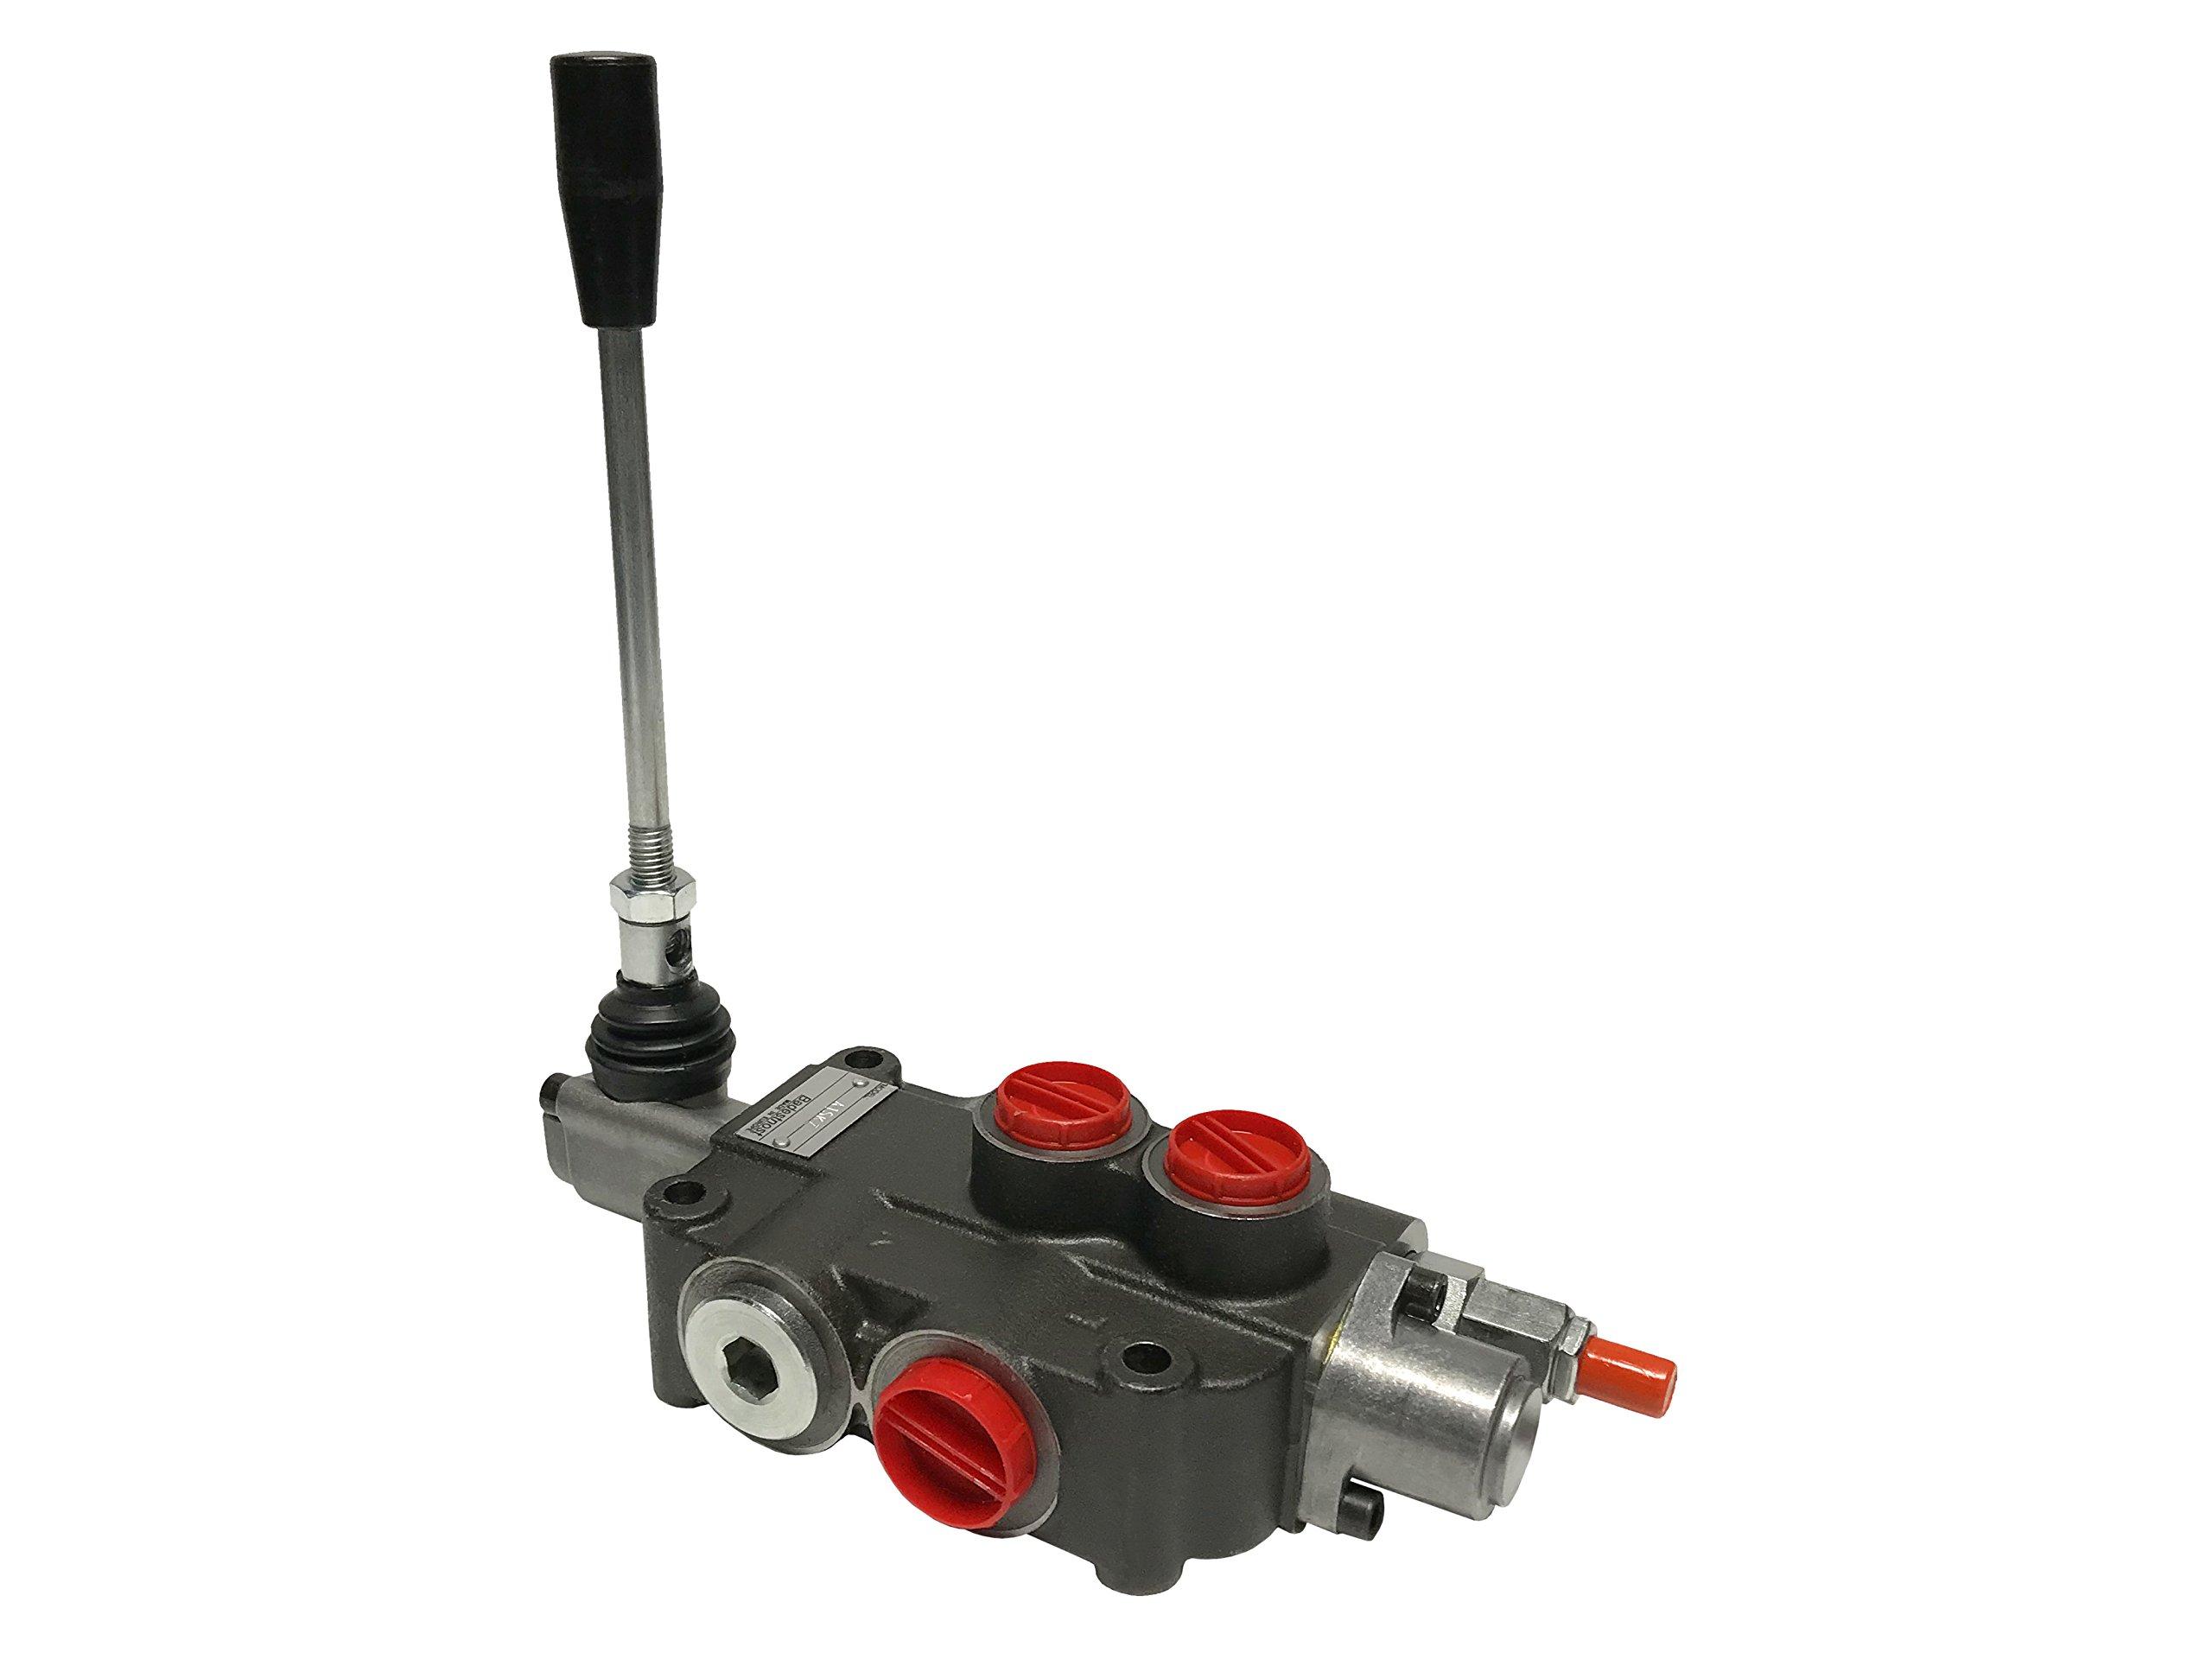 Hydraulic Directional Control Valve 1 spool 21 GPM Flow 4-way Tandem Center